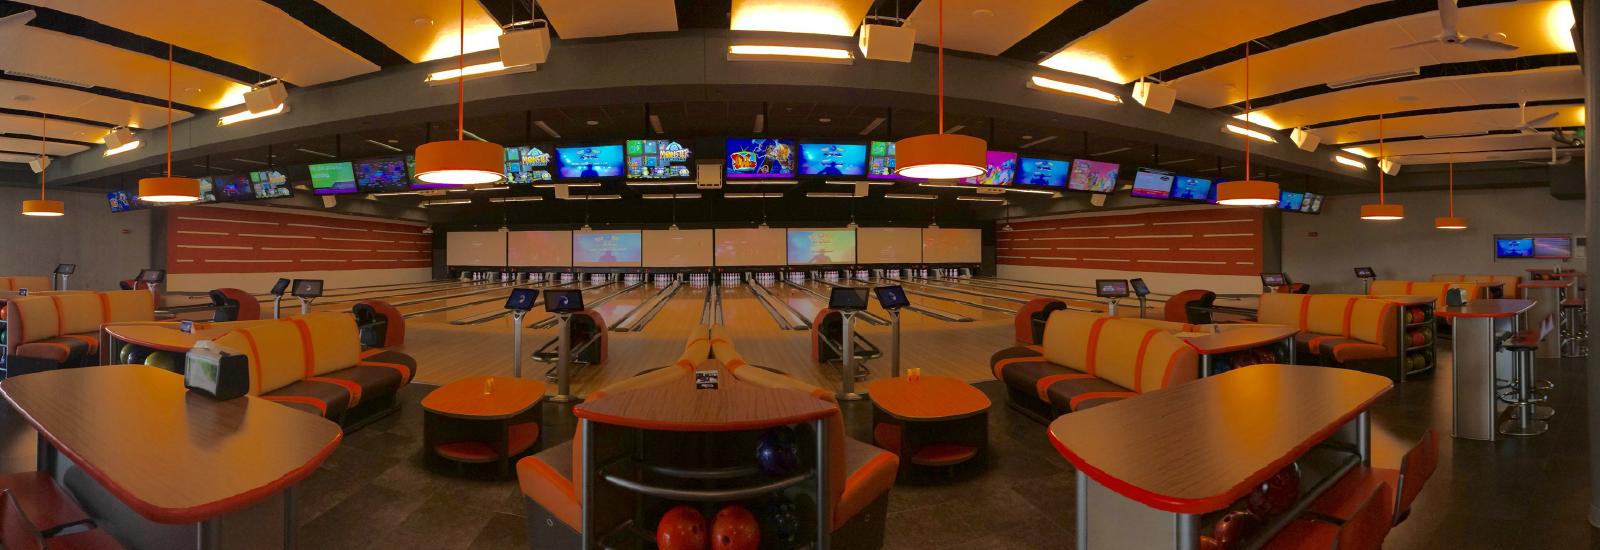 Whiteman AFB Bowling Alley